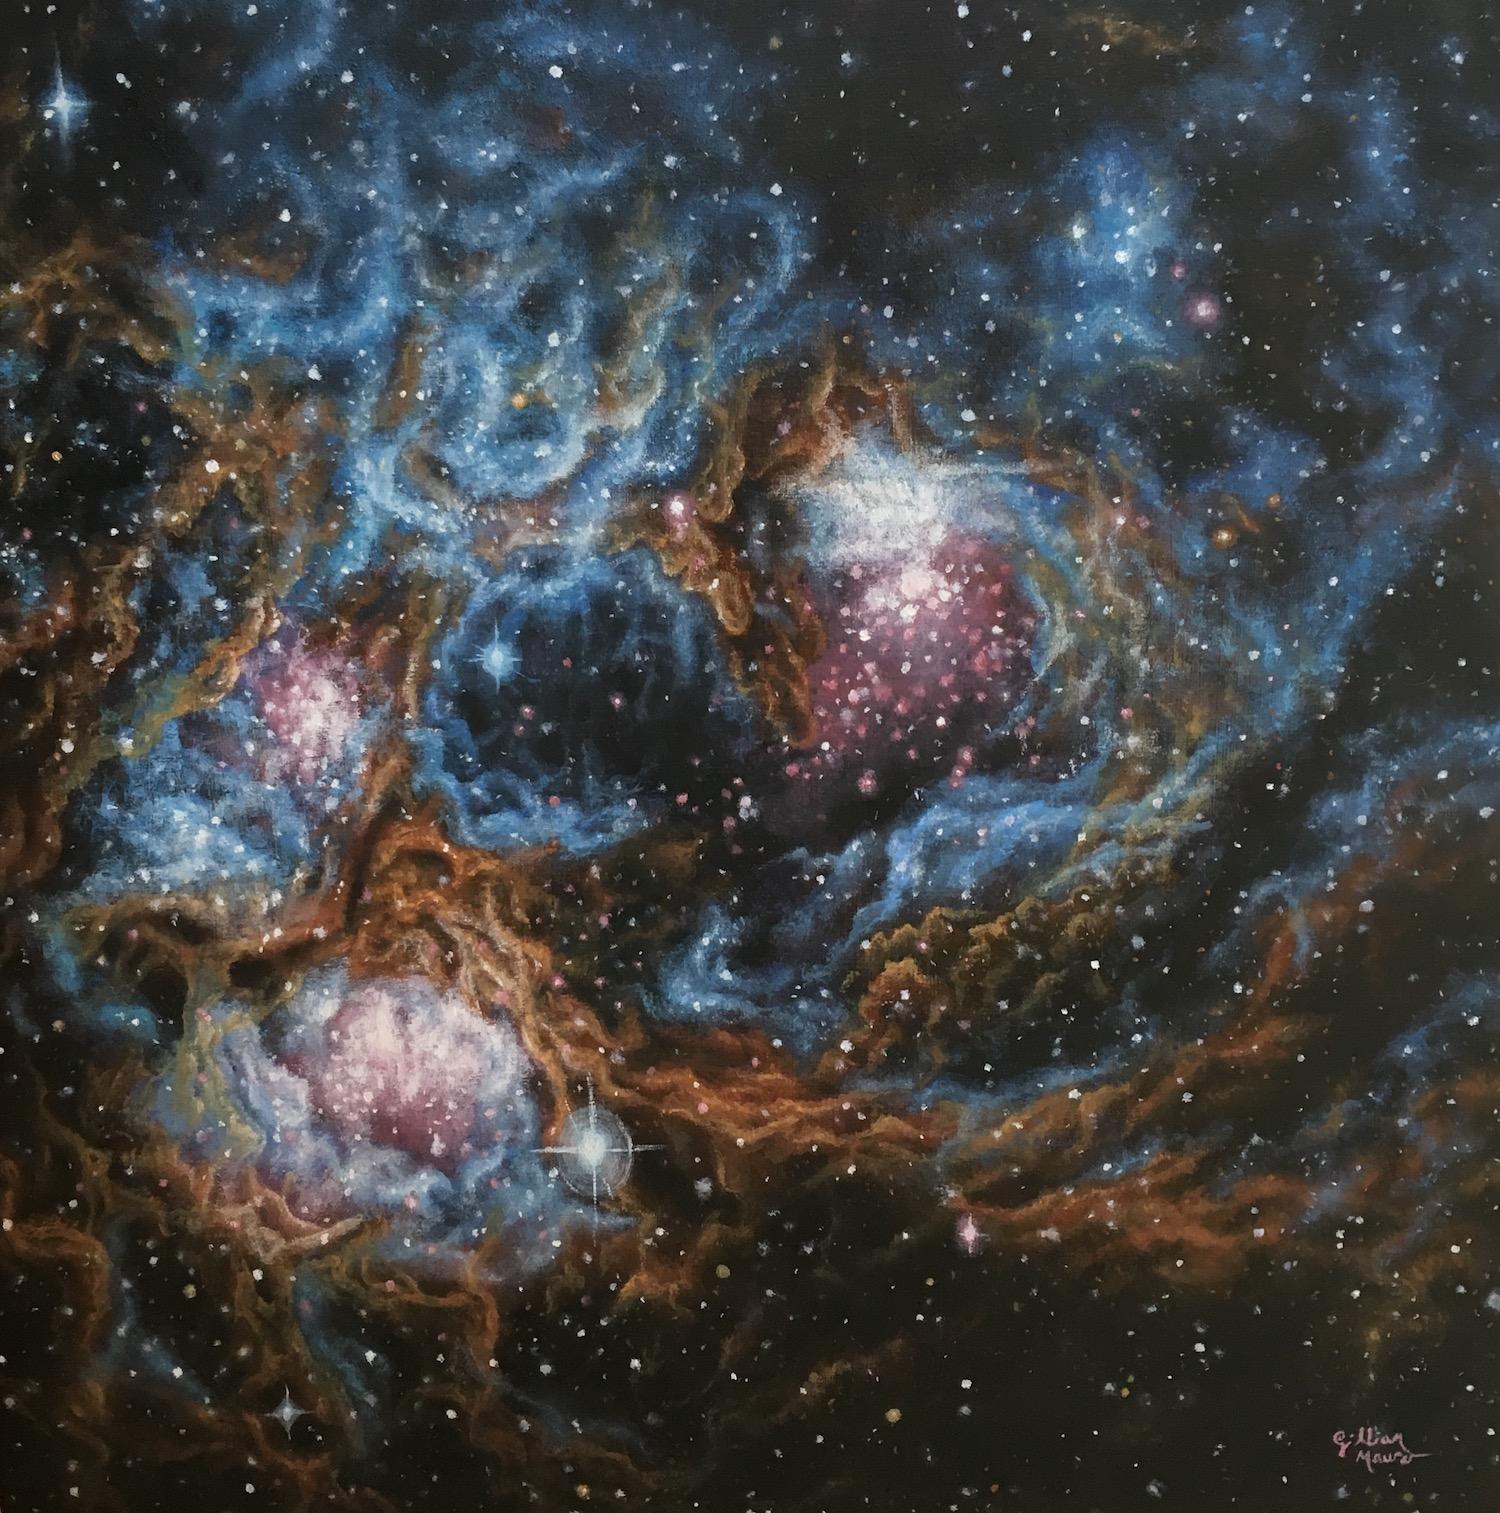 """Star Study 1"" Oil Paint on Wood Panel. 2017. Gillian Maurer."